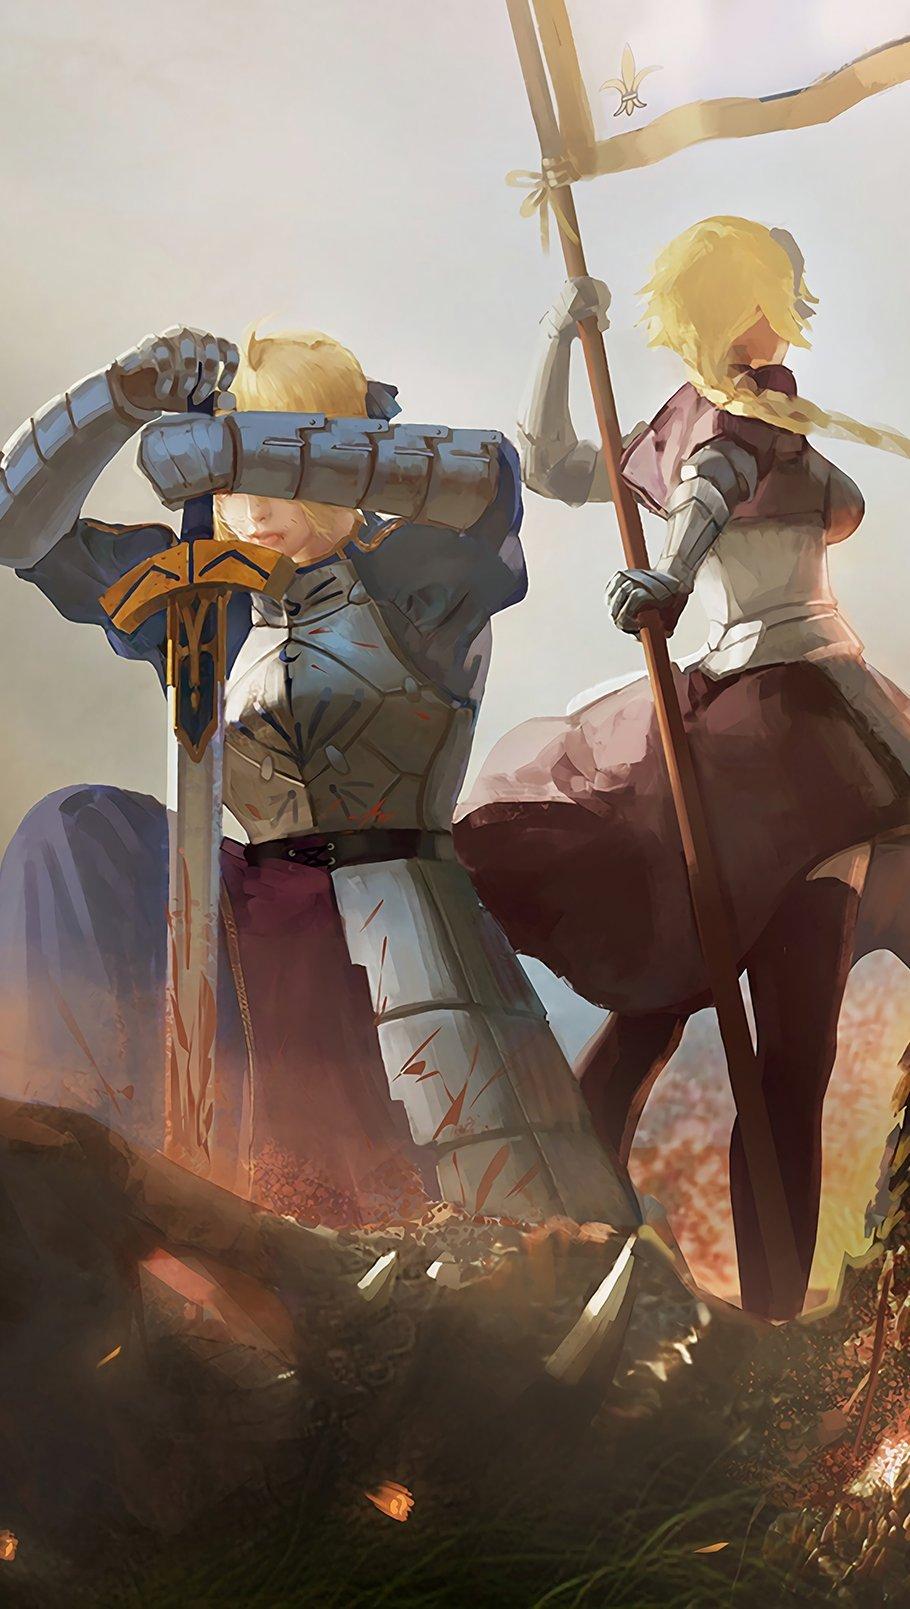 Fondos de pantalla Anime Personajes de Fate Grand order Vertical